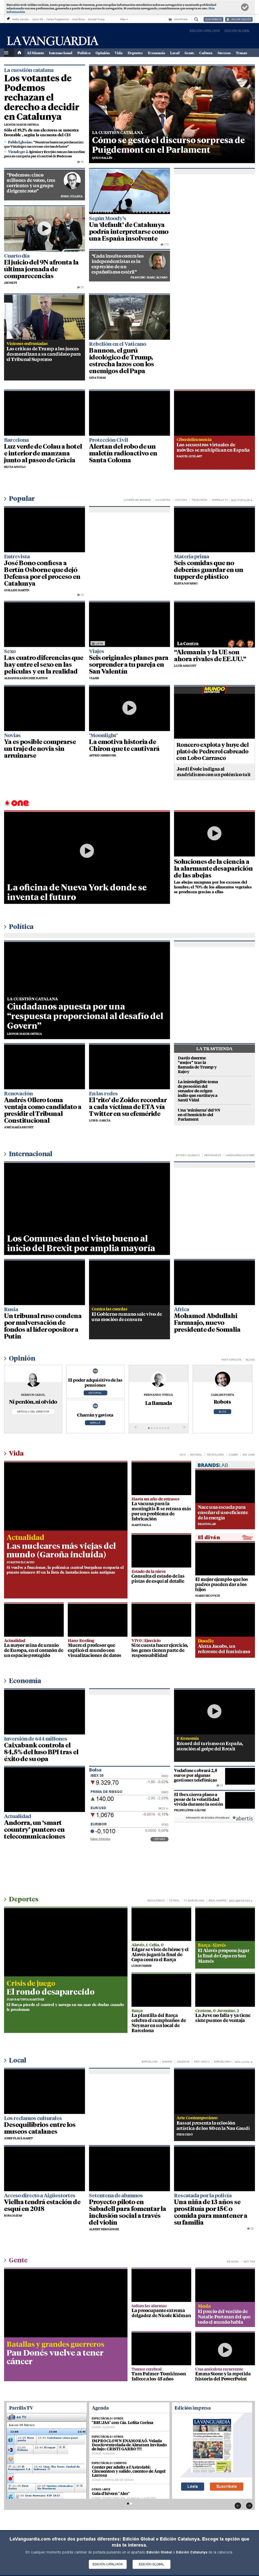 La Vanguardia at Thursday Feb. 9, 2017, 7:22 a.m. UTC